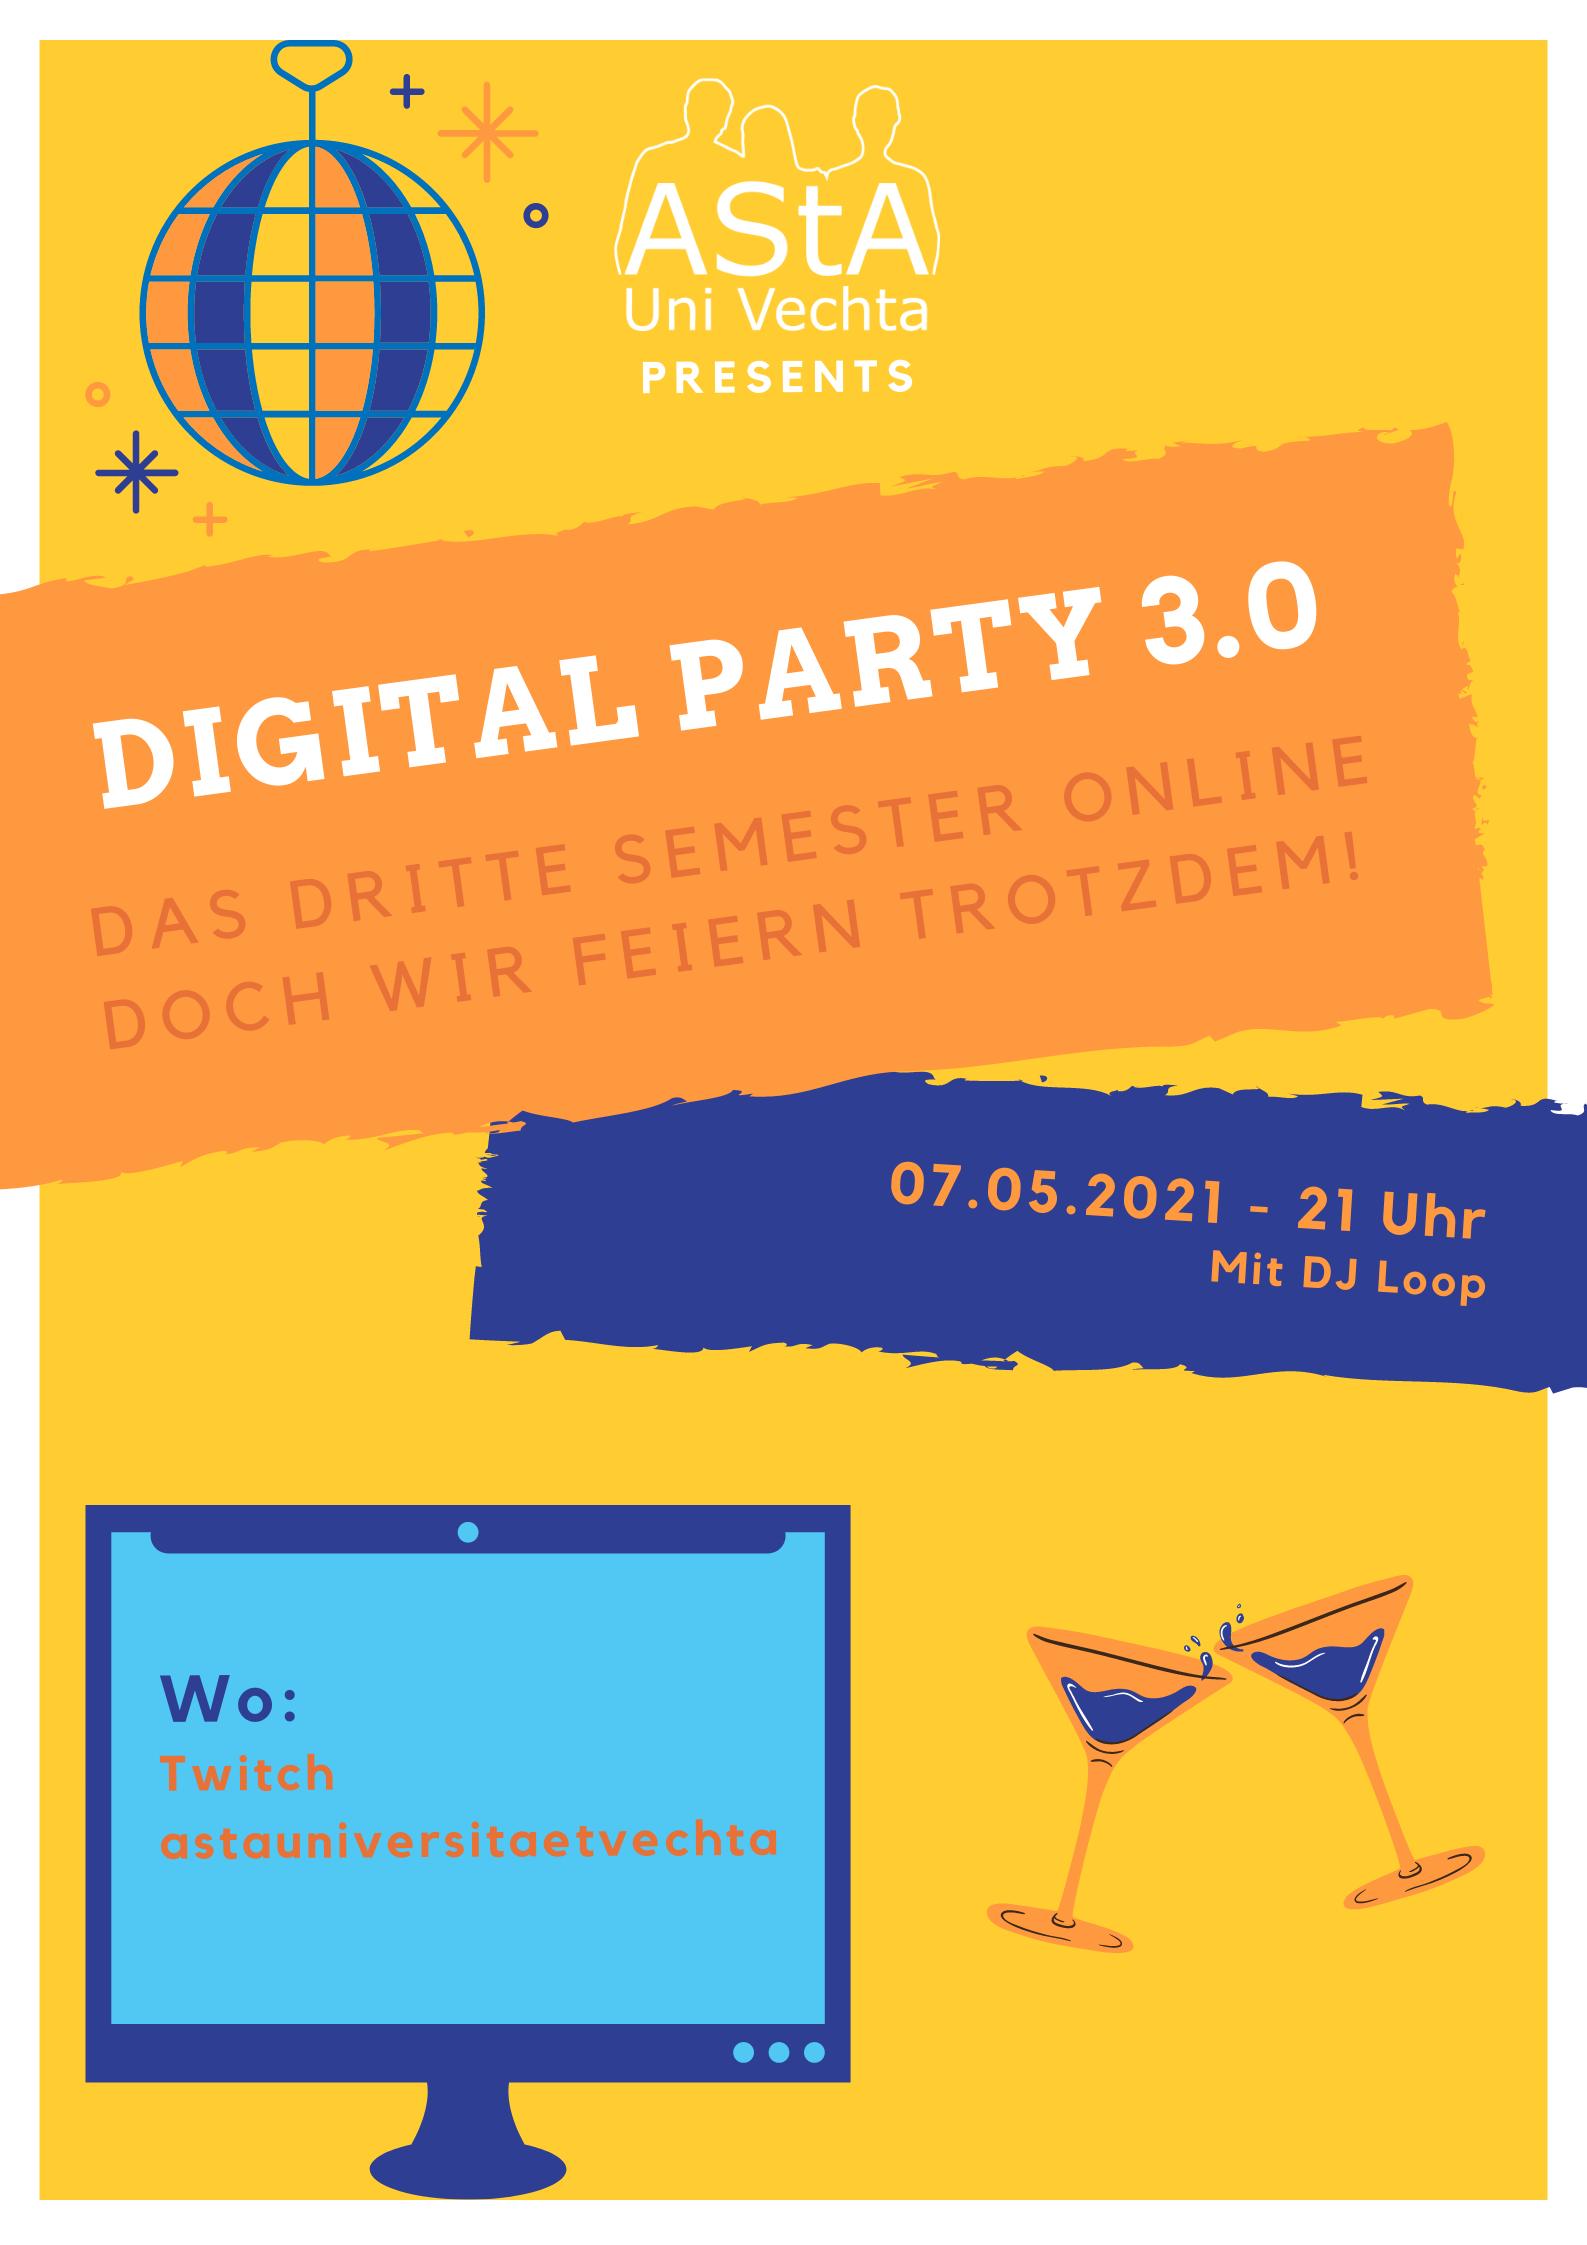 Digital Party 3.0 - Das dritte Semester online, doch wir feiern trotzdem @ twitch.tv/astauniversitaetvechta